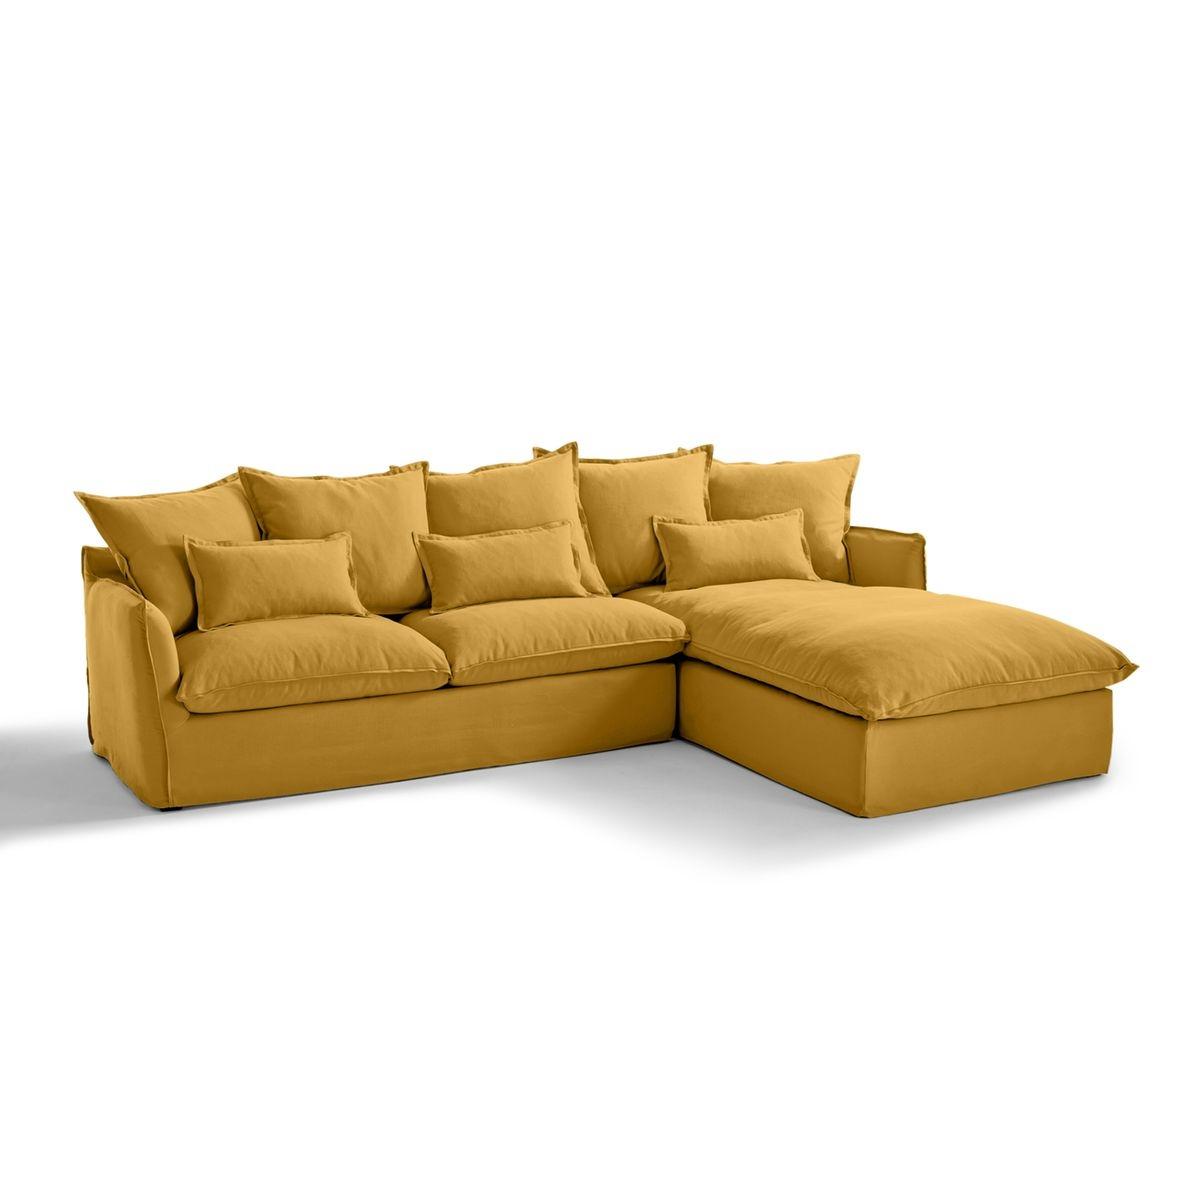 Canapé d'angle fixe en coton/lin, Odna Bultex